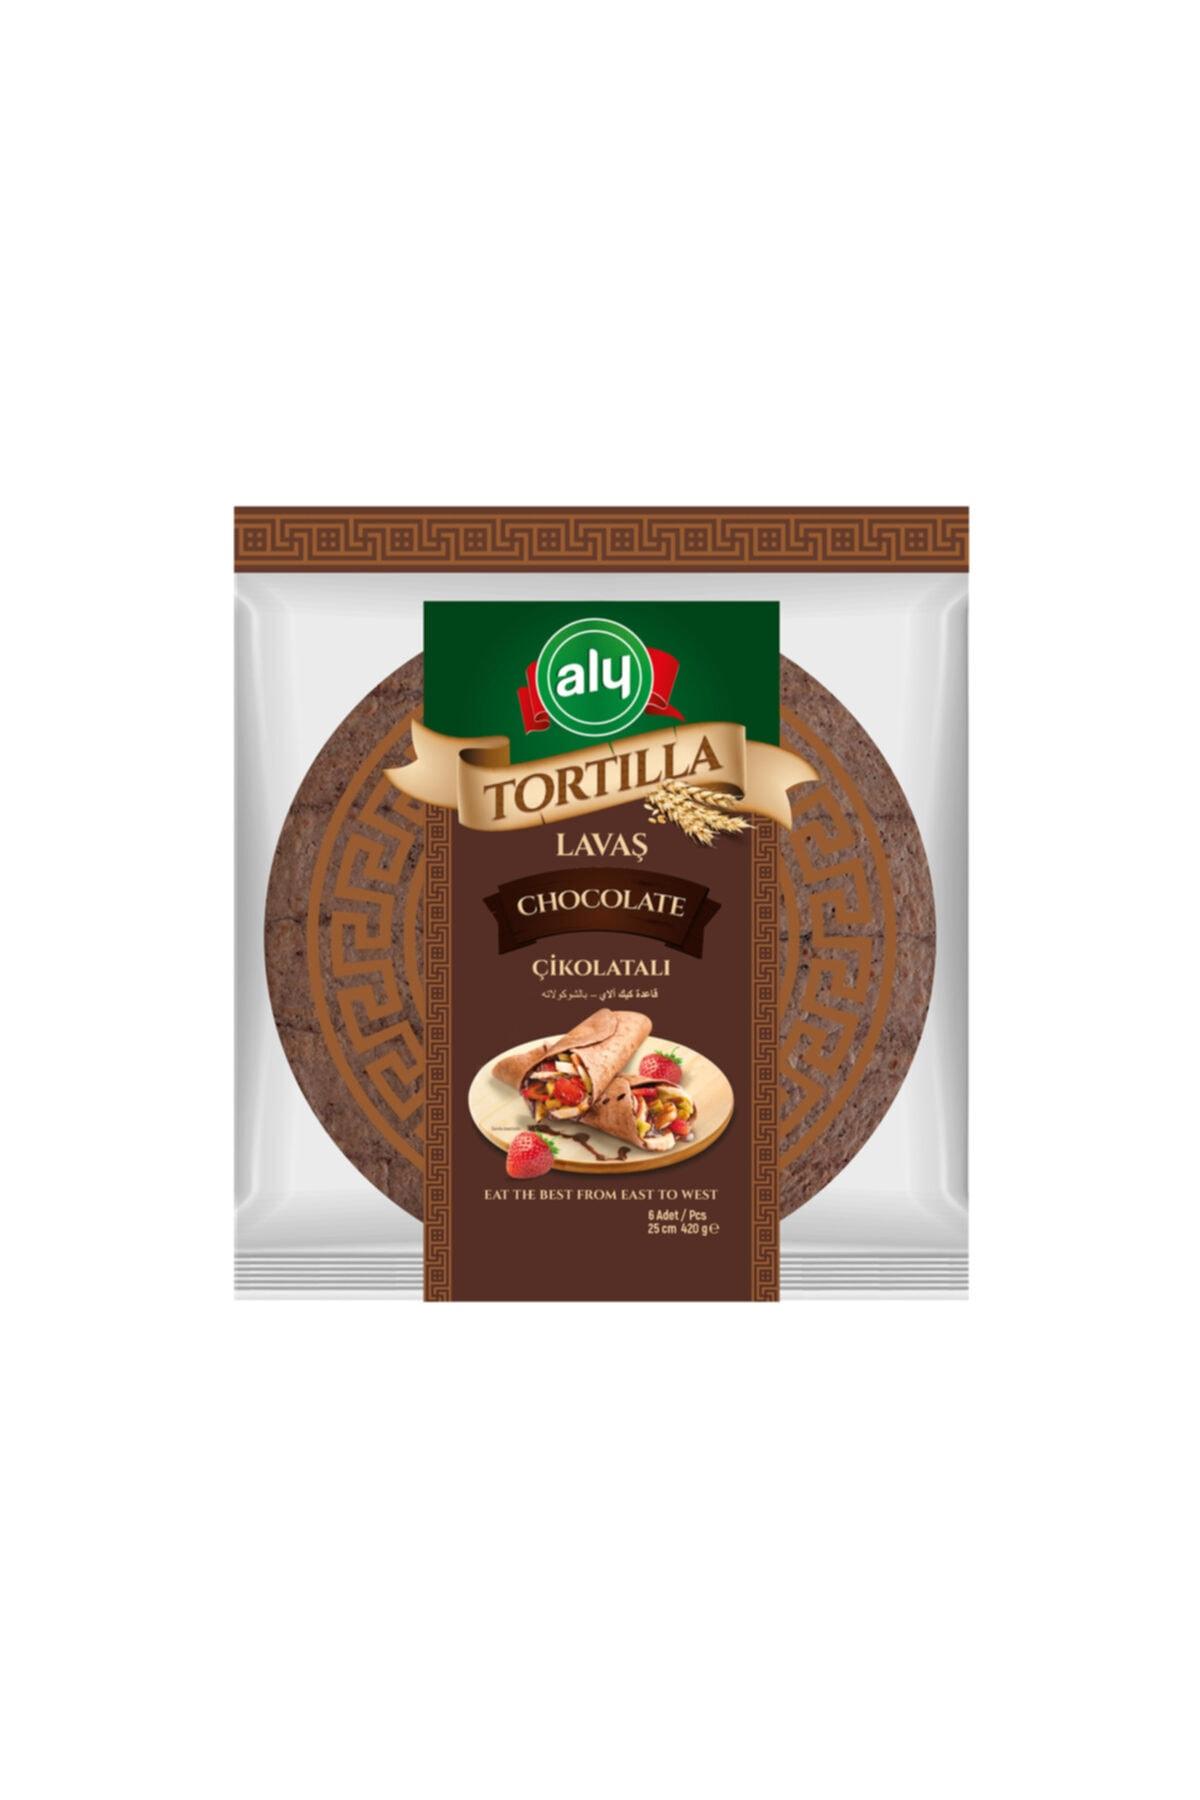 Çikolatalı Tortilla Lavaş 25 cm 6'lı Paket 420g